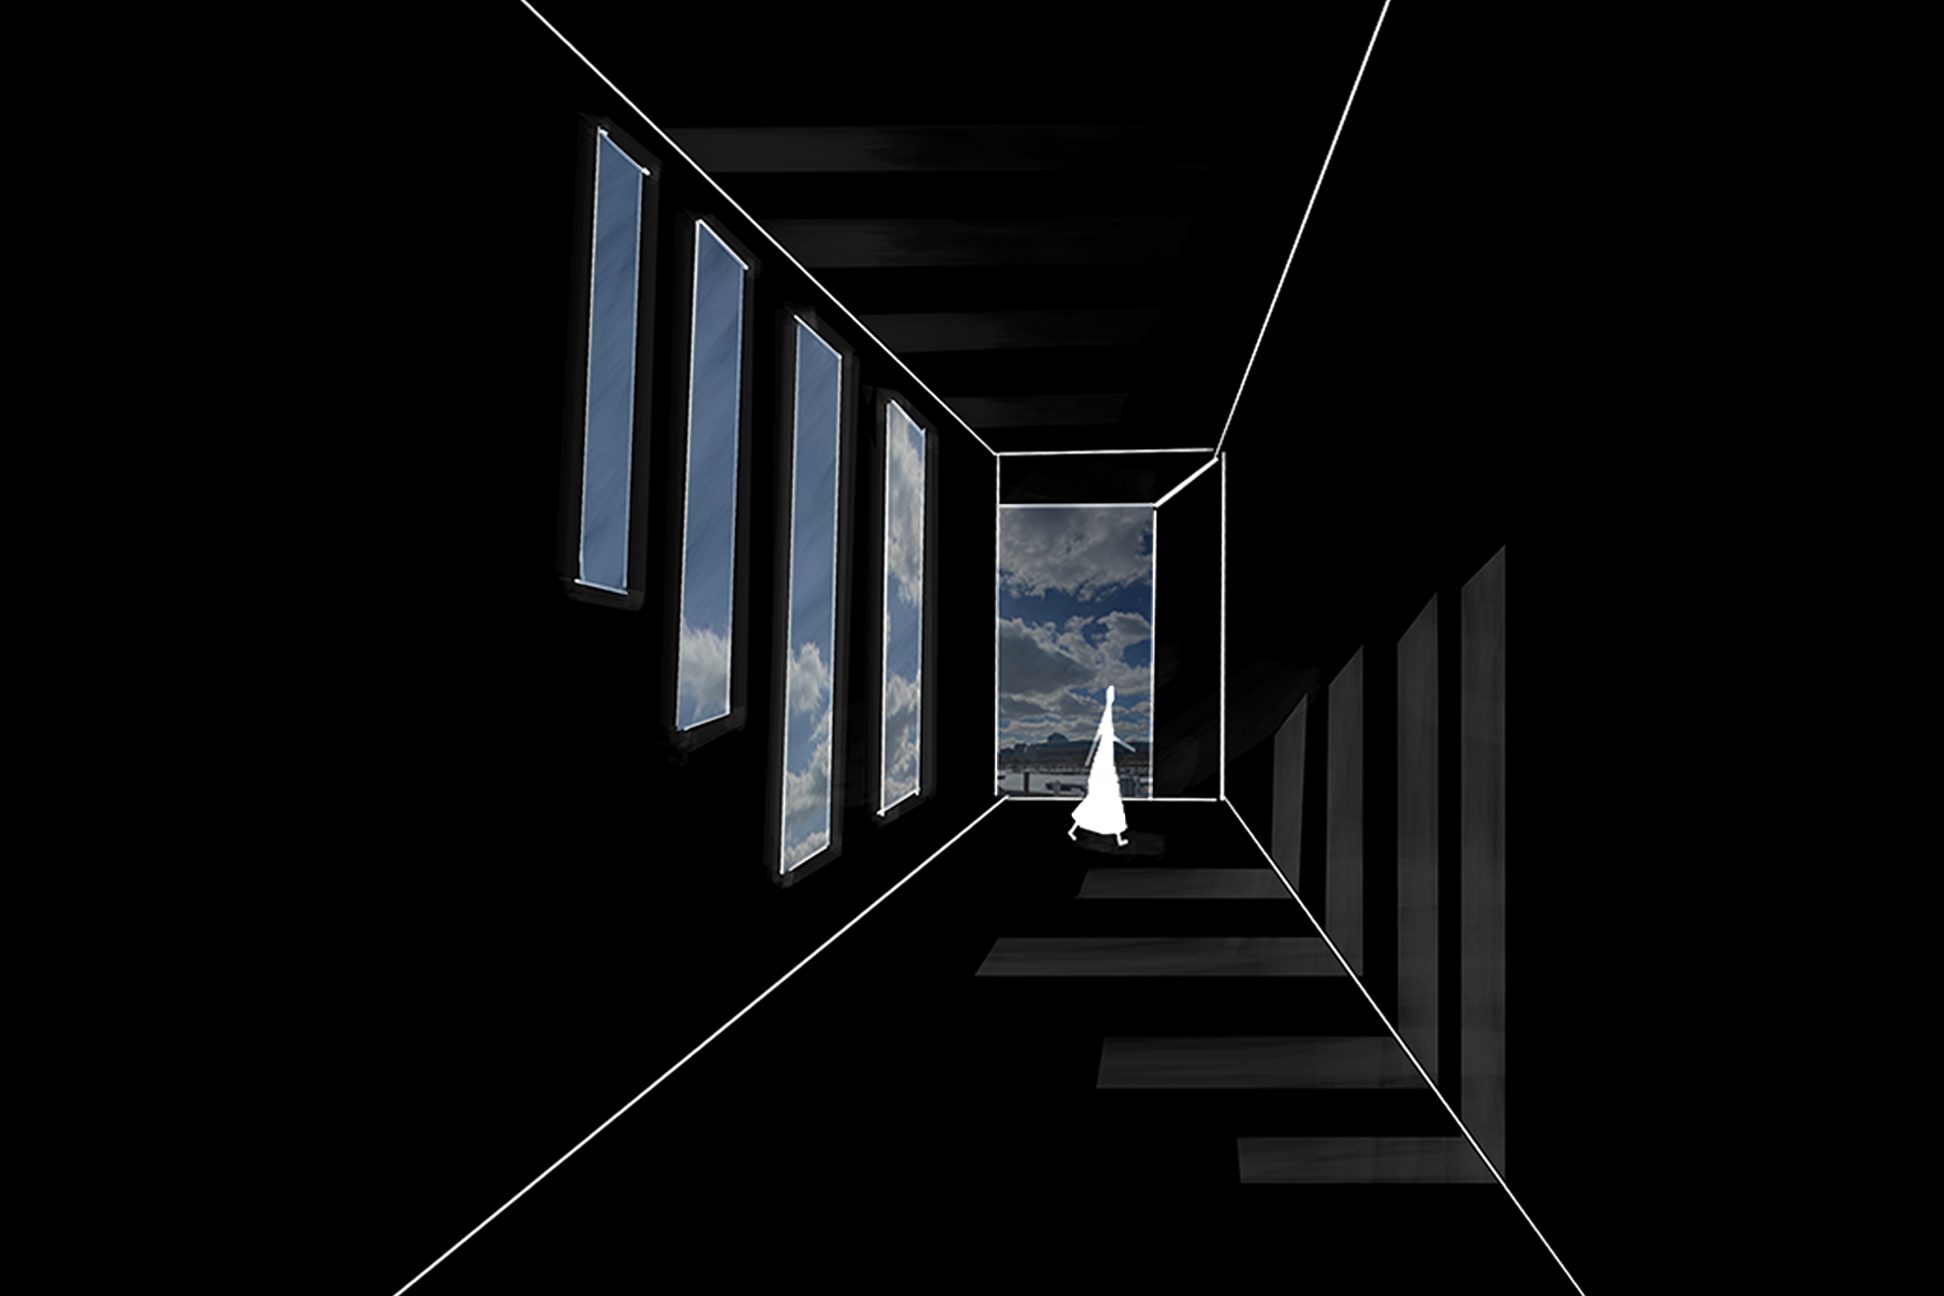 Yesha A. Mody - Phenomena 2, 2021, Digital Collage, 27 x 18 in.